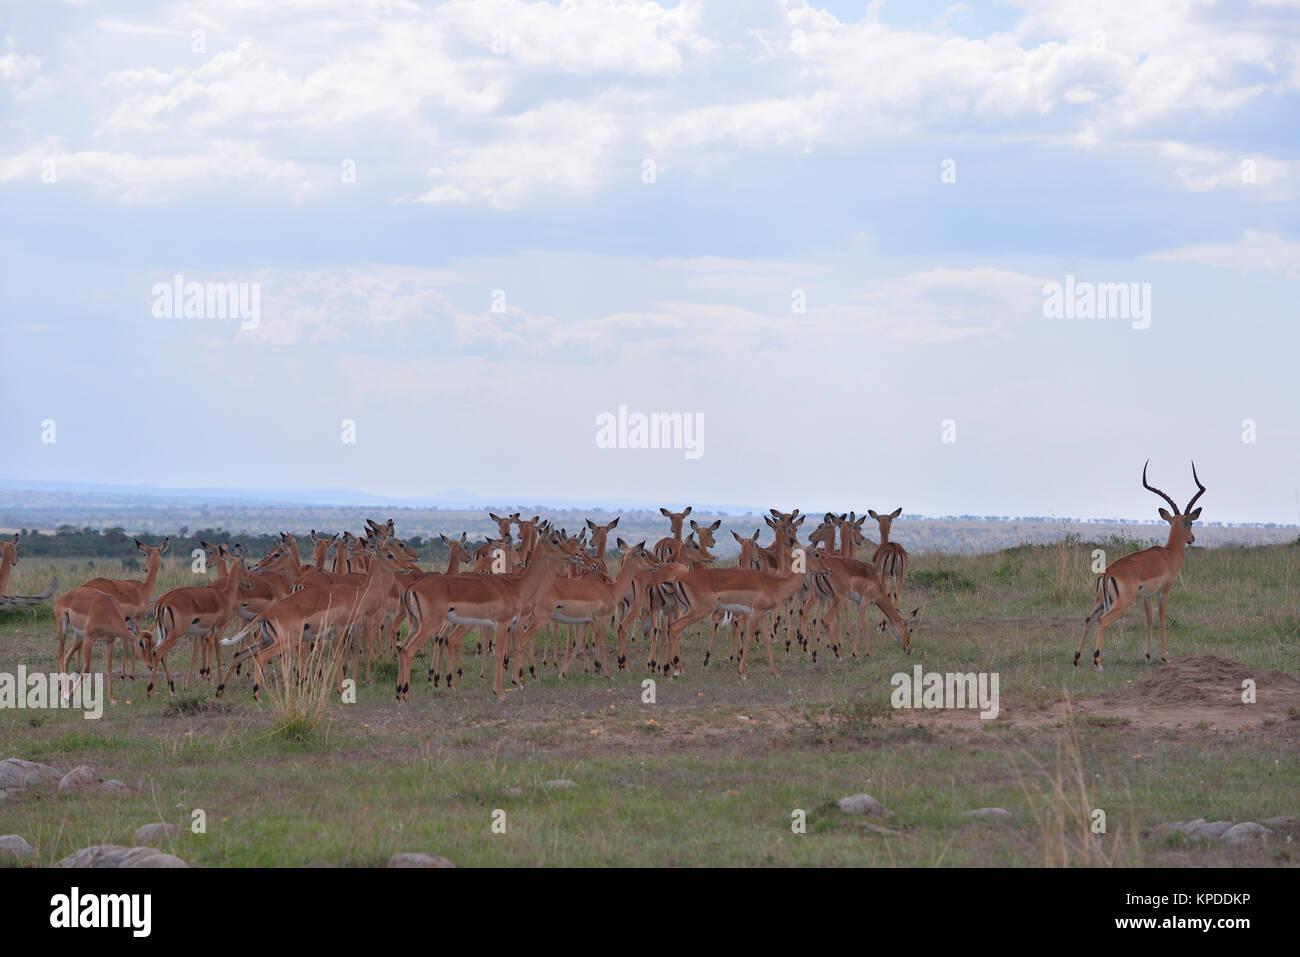 Wildlife in Maasai Mara, Kenya. Impala herd on skyline - Stock Image